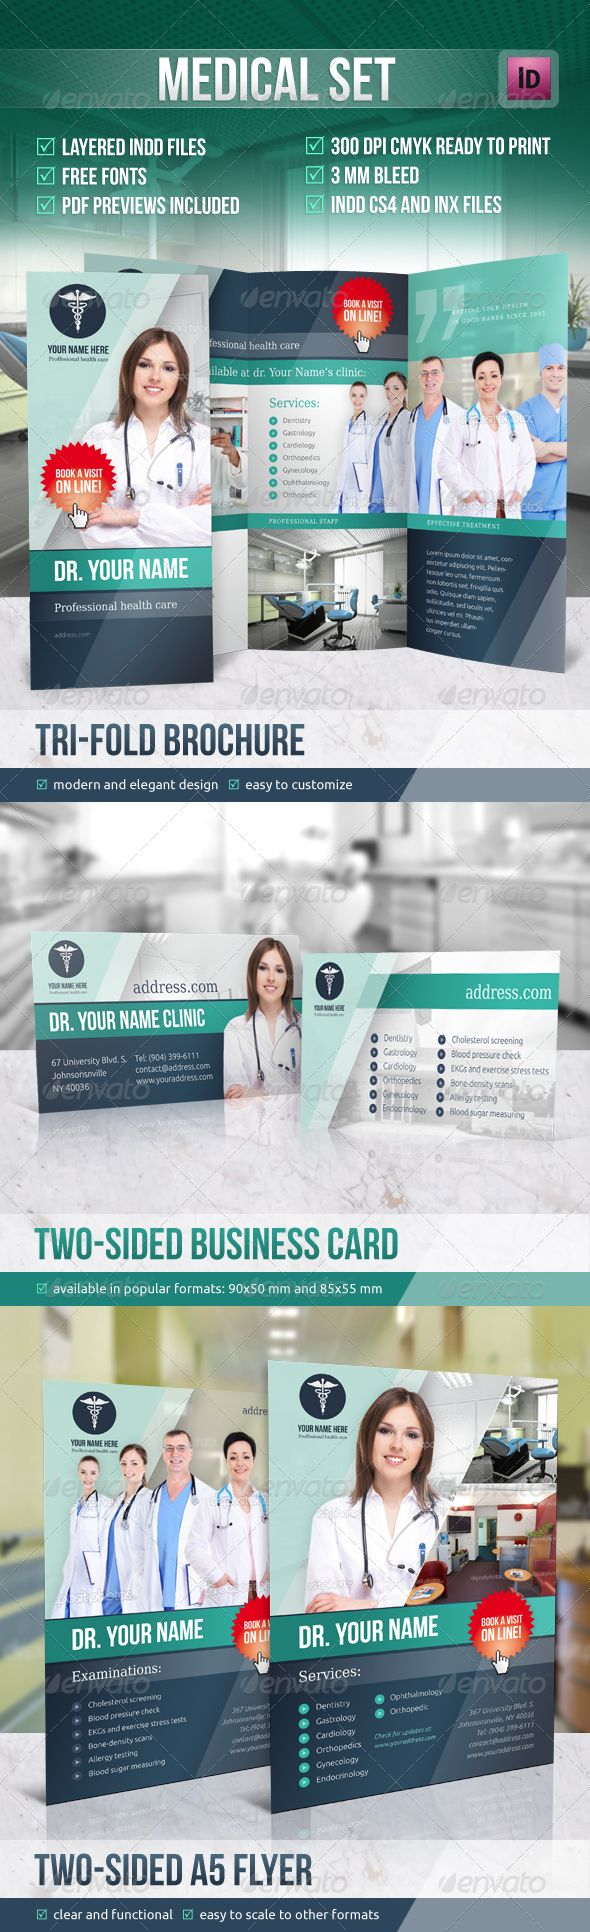 best ideas about flyer a flyer pas cher medical set